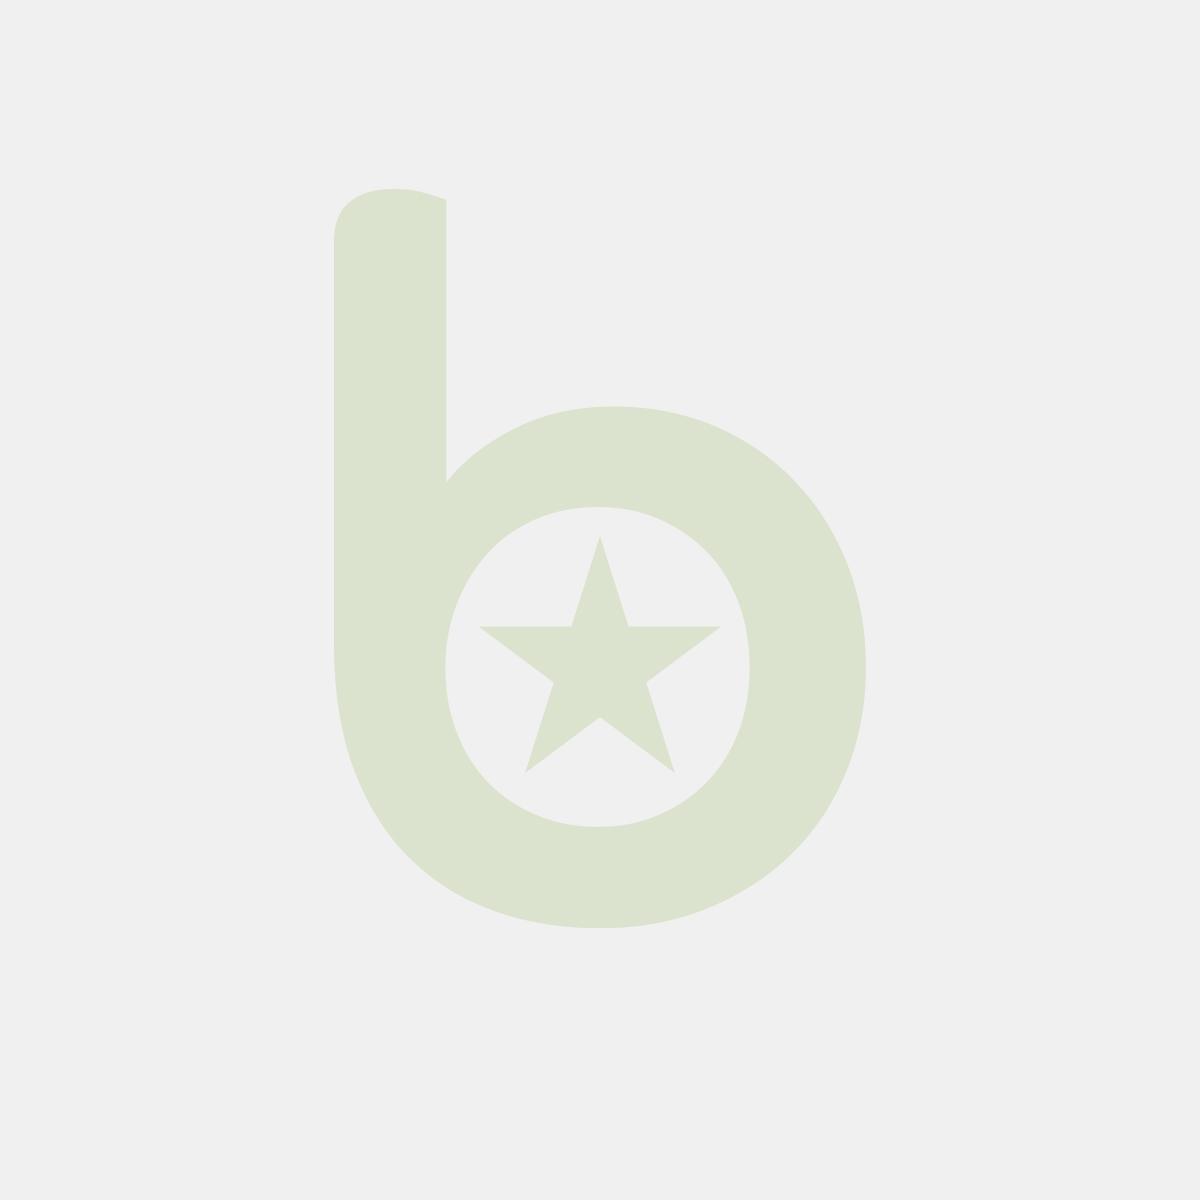 Pucharek MINI FINGERFOOD czarny, PS, 25 szt. w opakowaniu